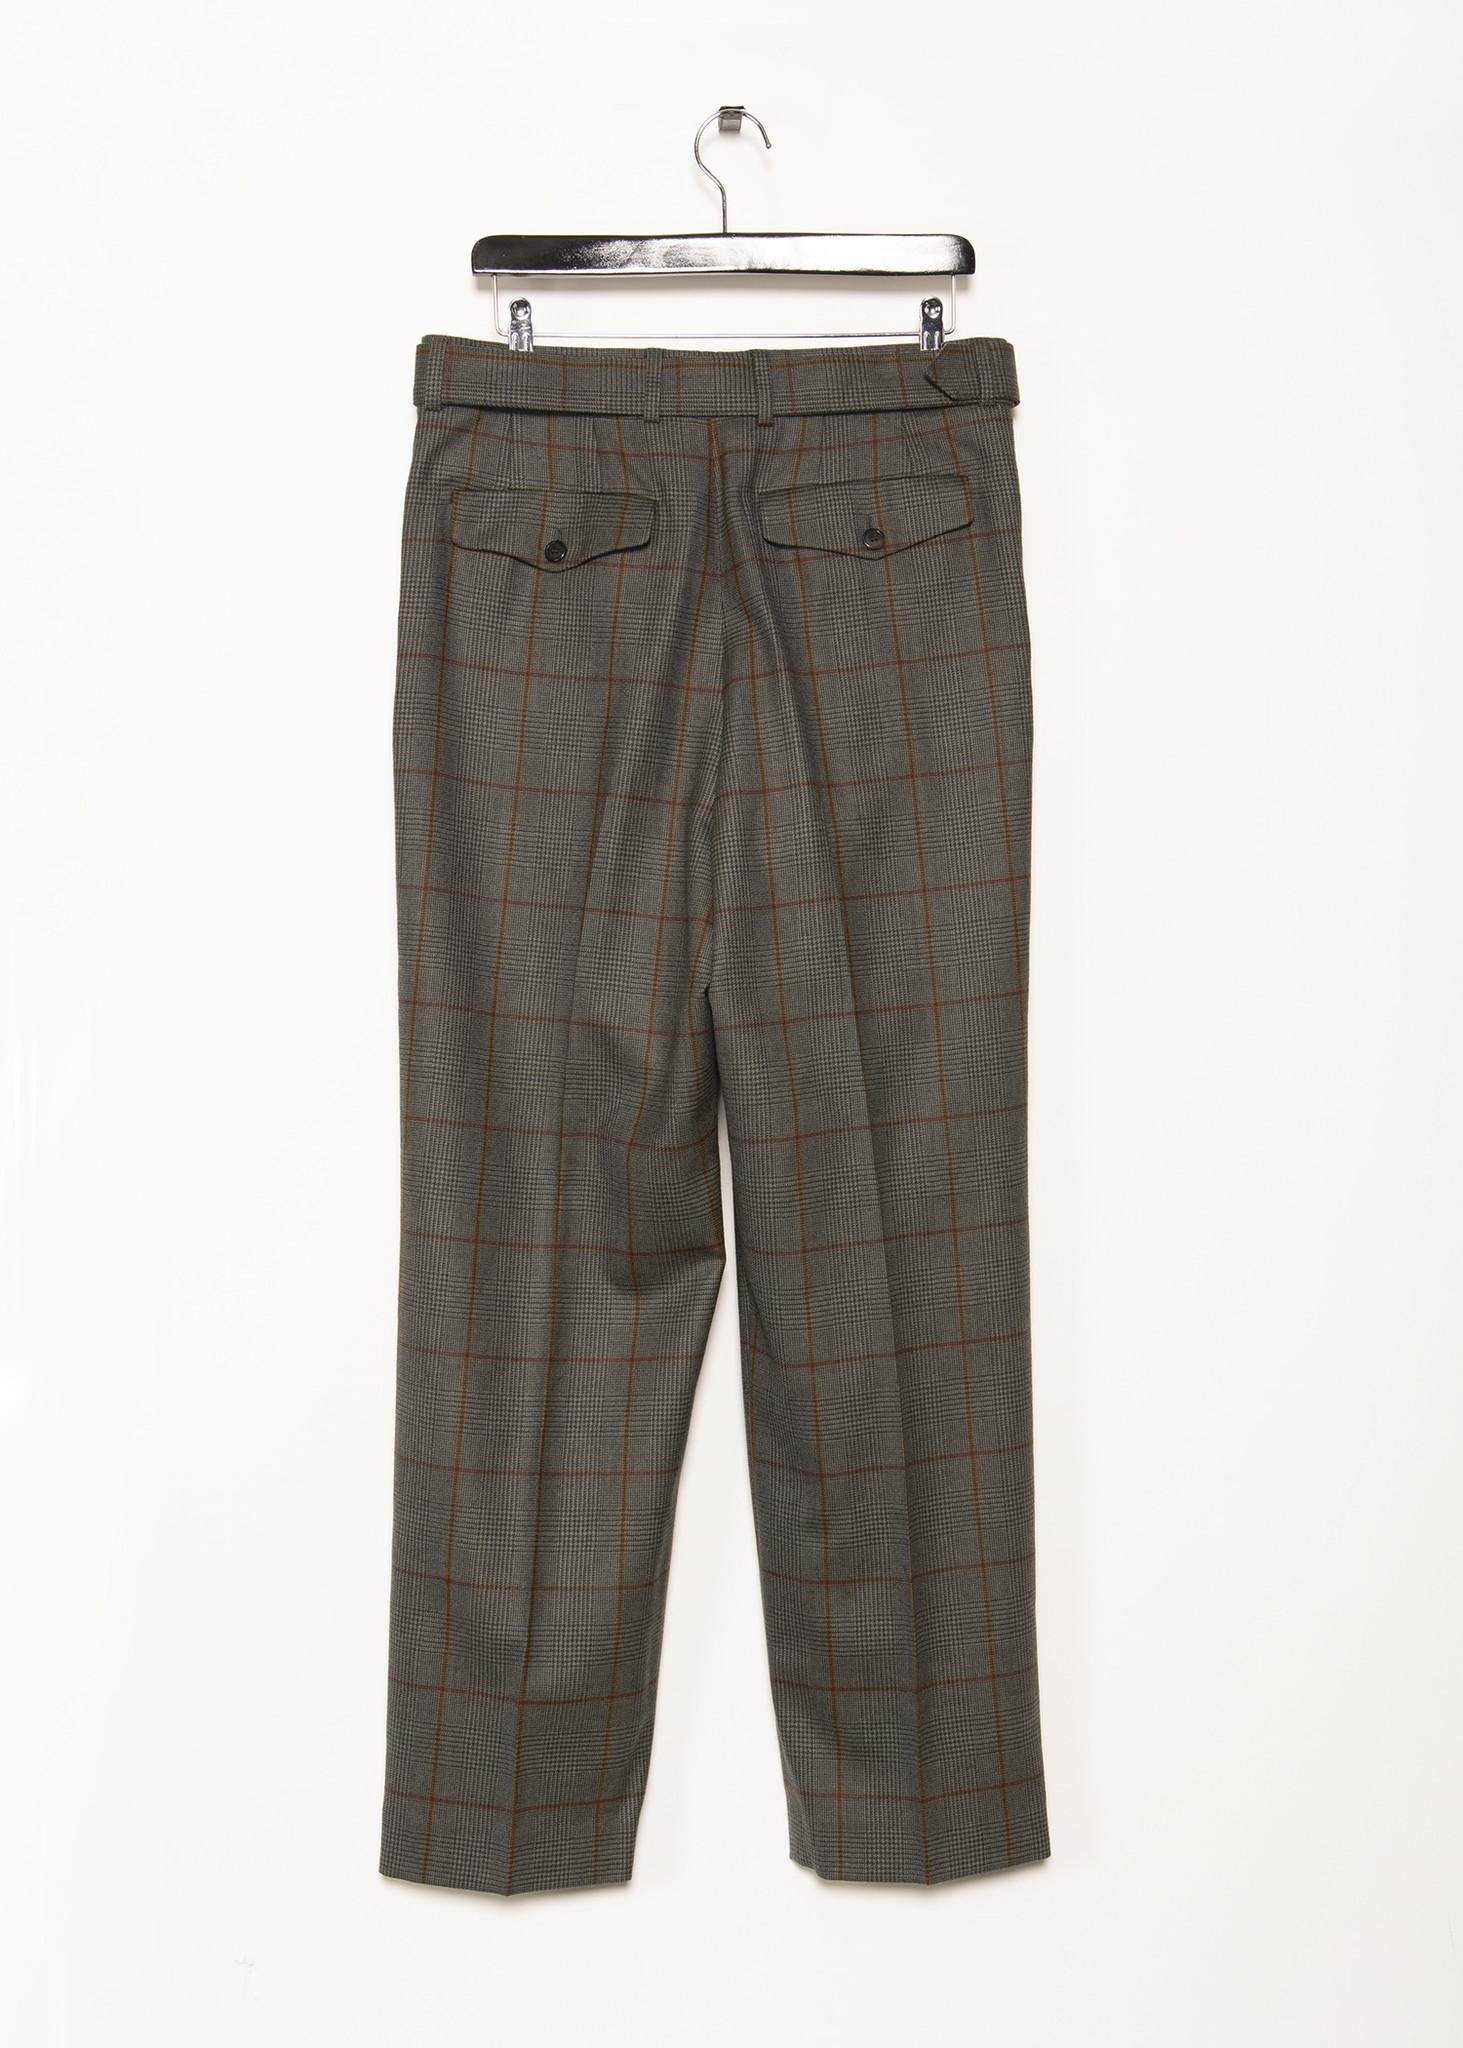 GM Pantalon dentra/înement